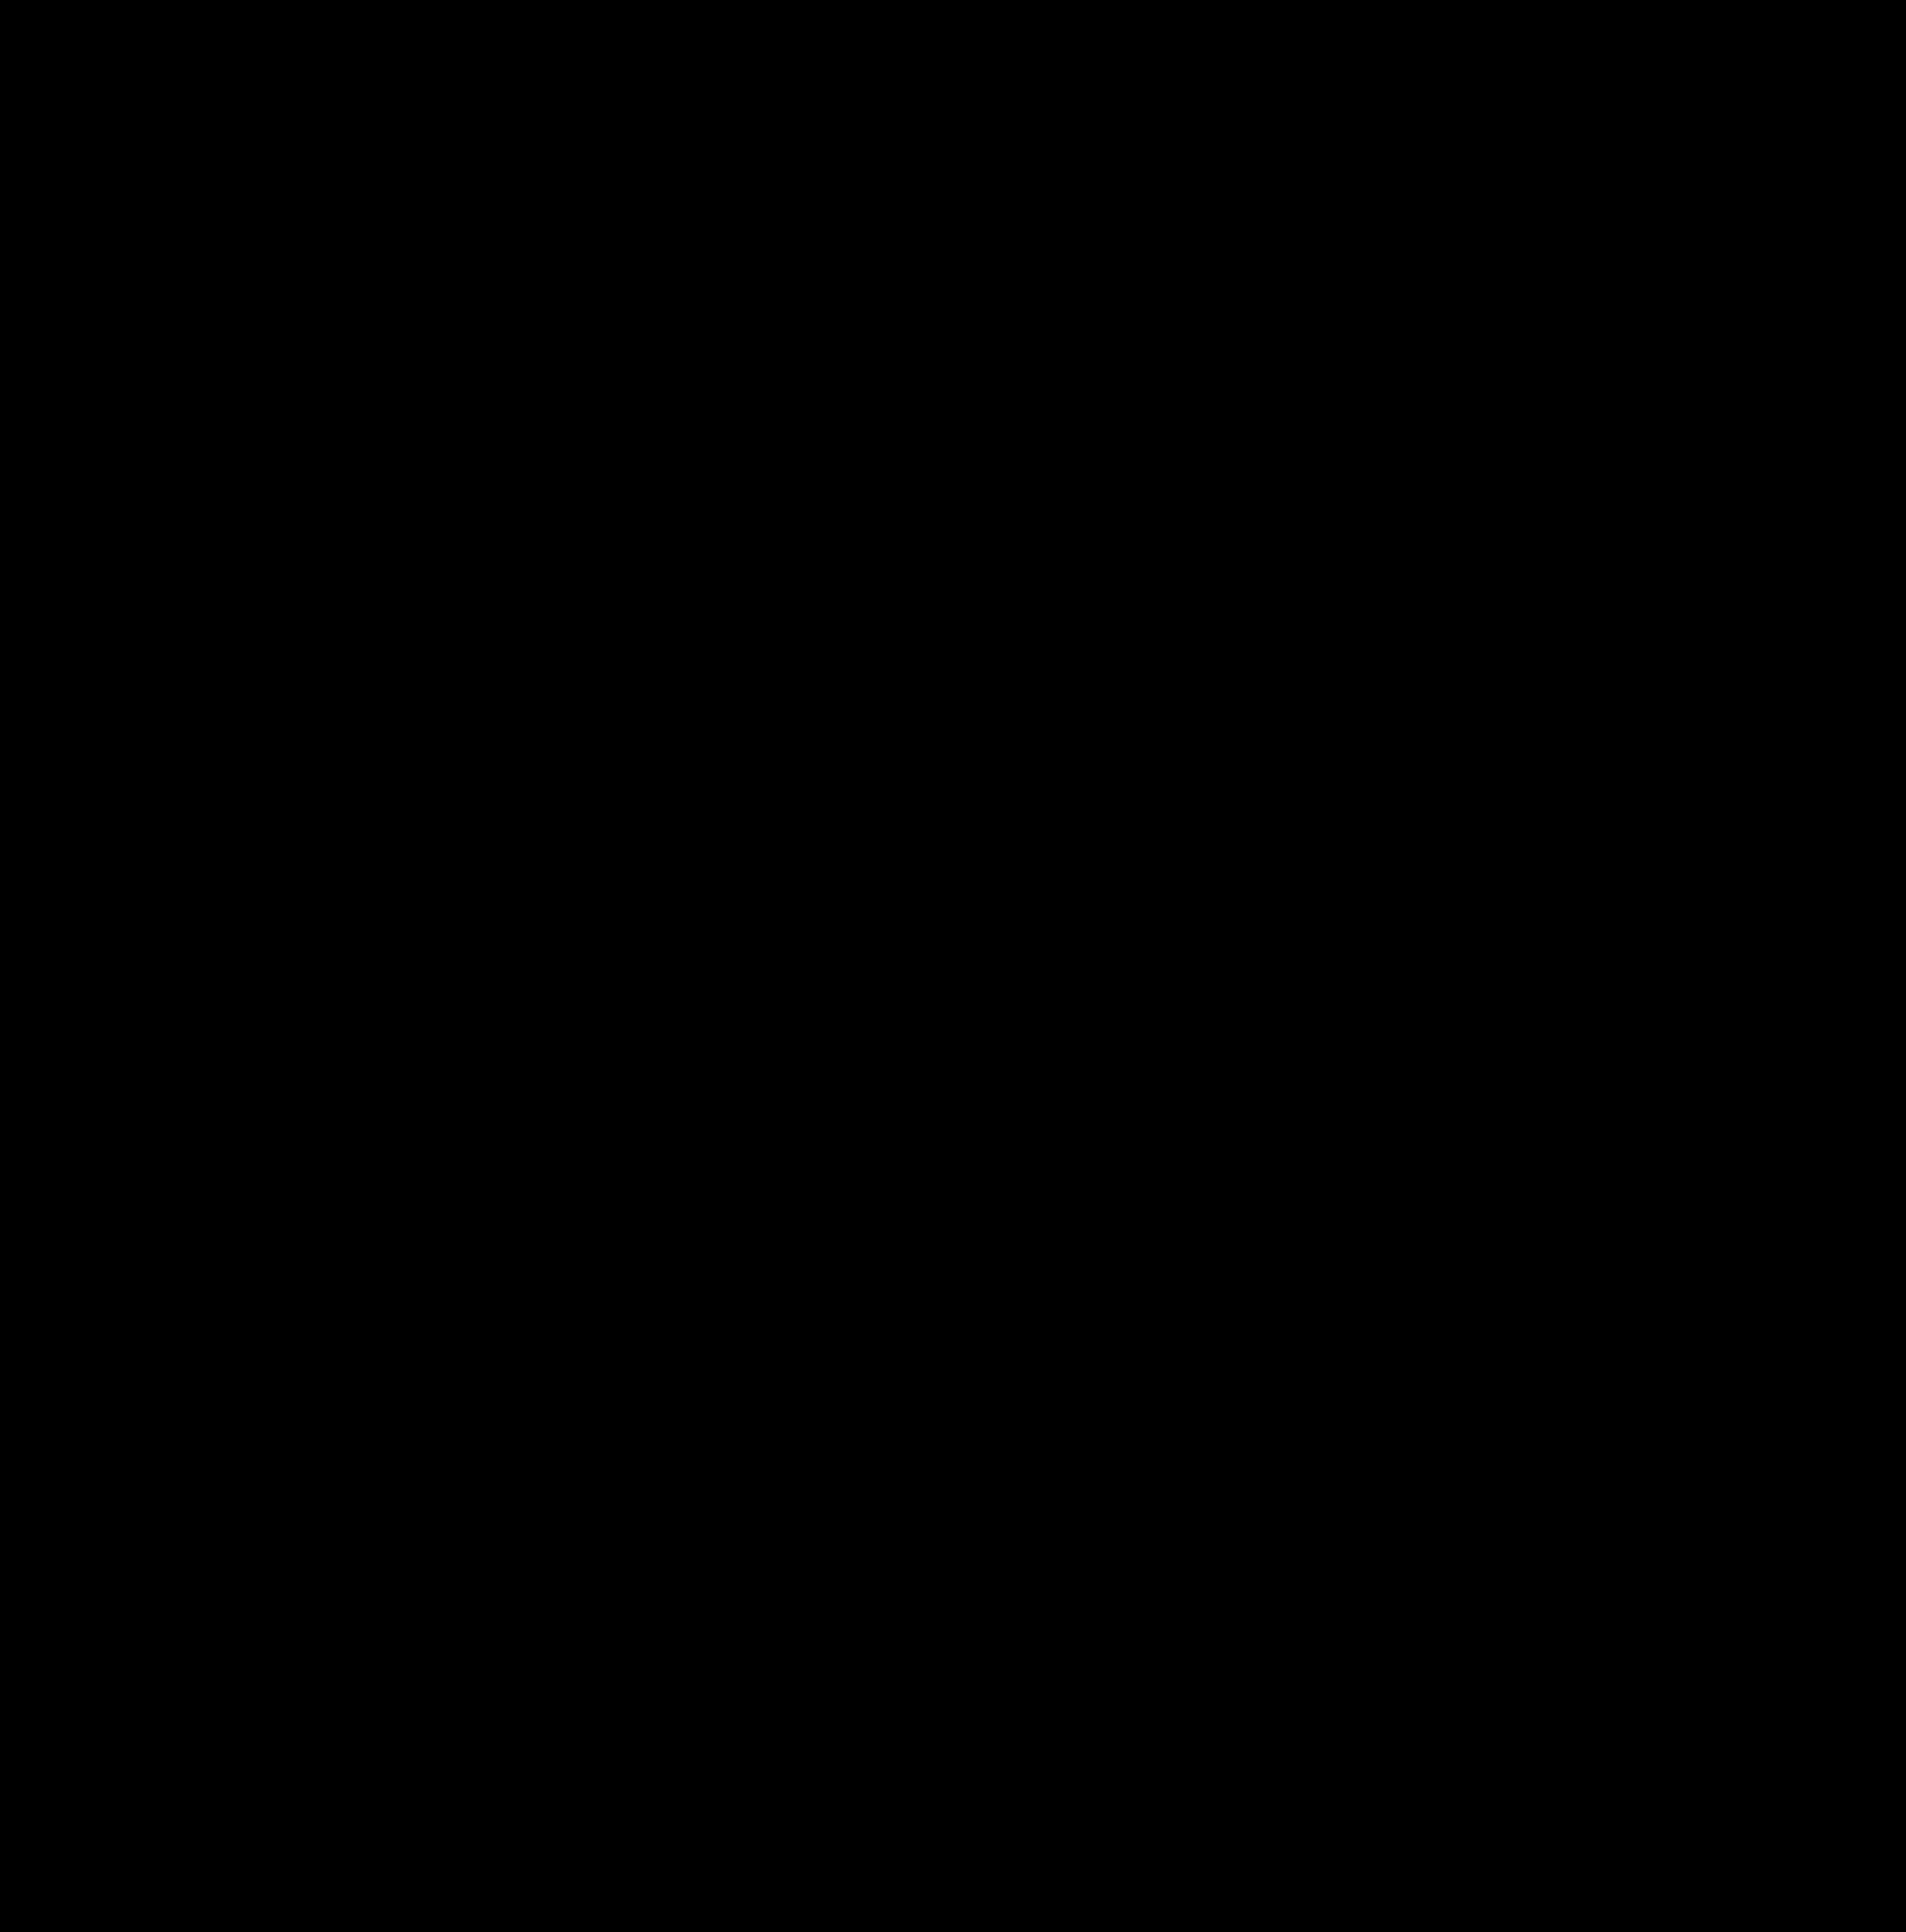 Internet Line Web Icon Logo Image.